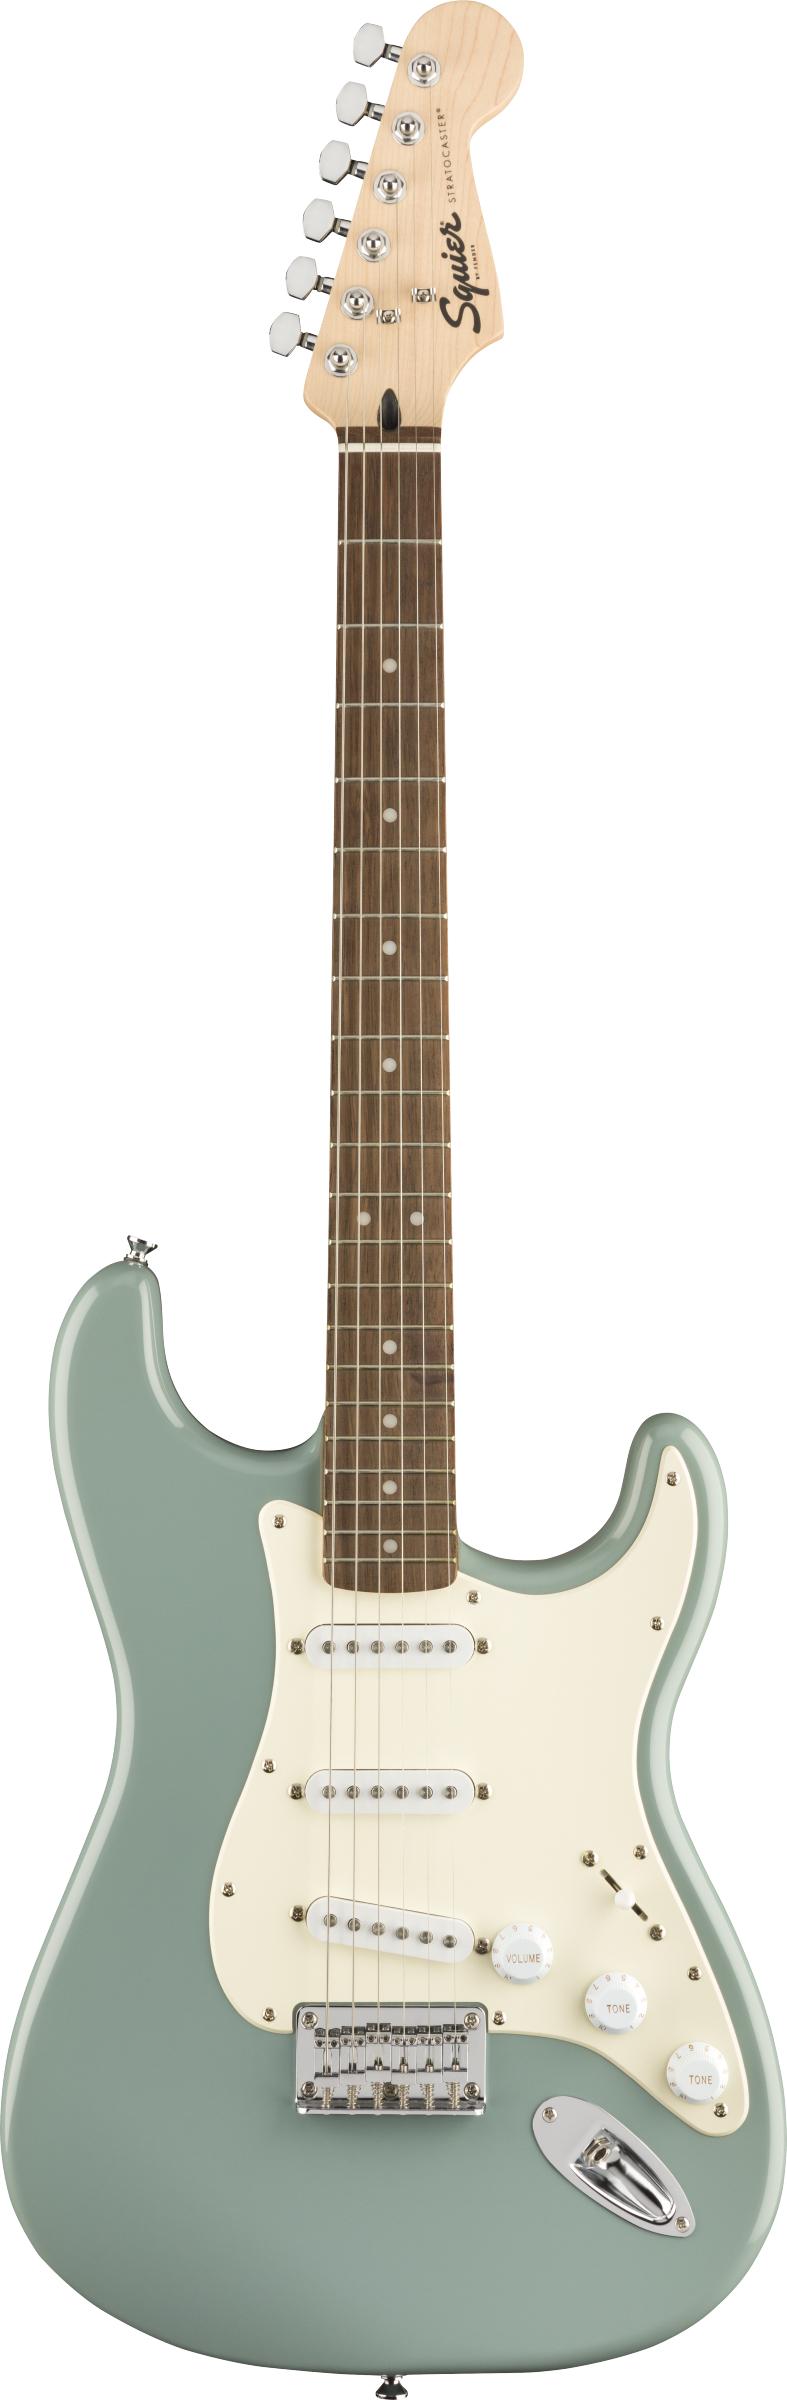 Squier Bullet Stratocaster HT, Laurel Fingerboard - Sonic Grey